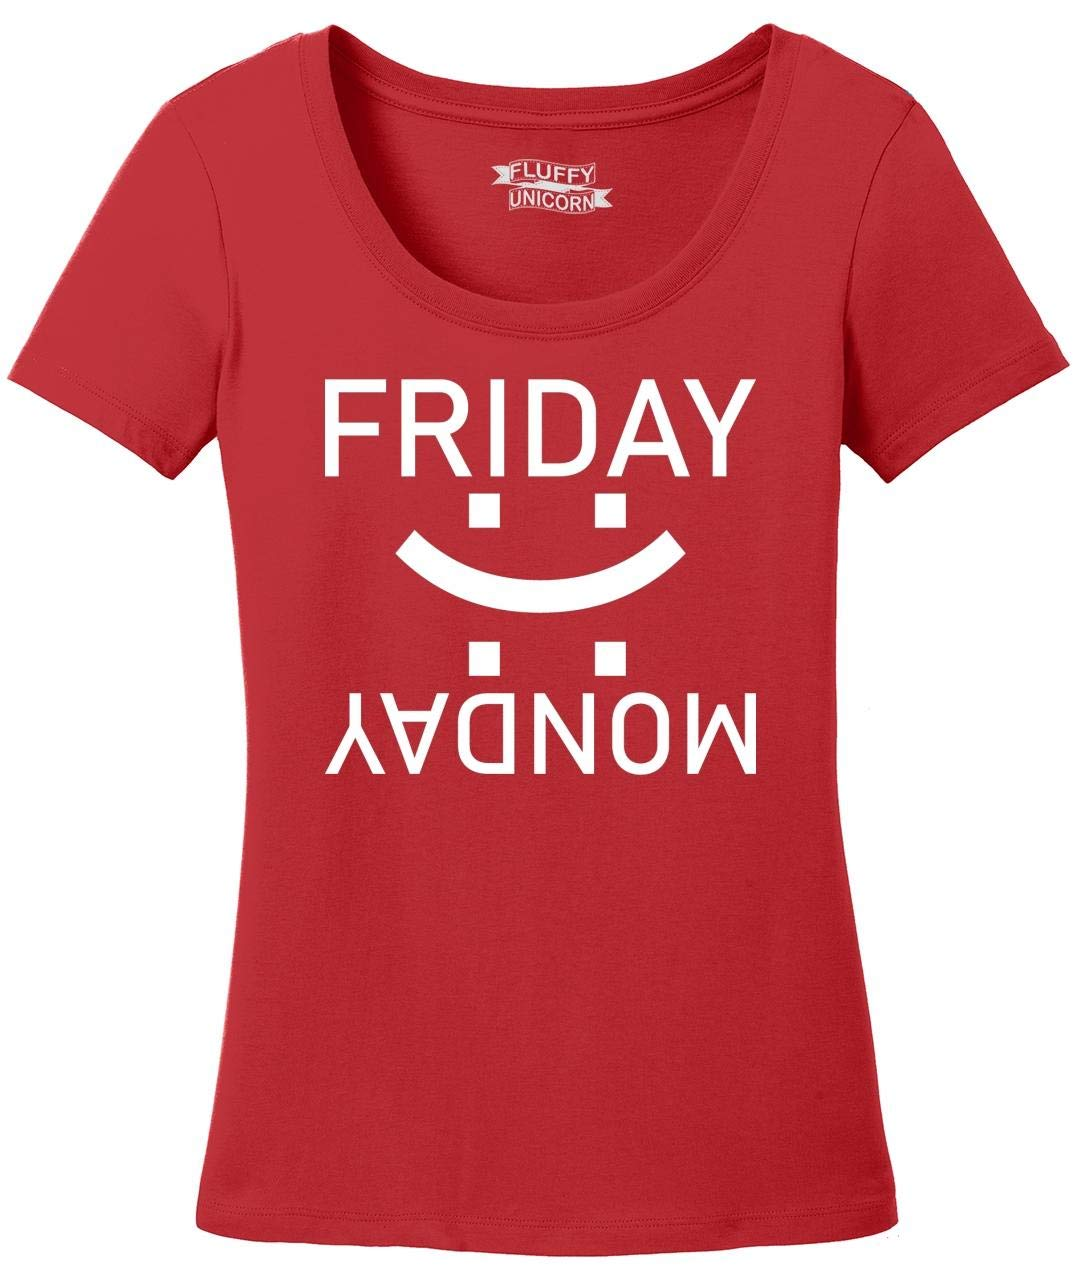 Happy Friday Sad Monday Scoop Tee 8608 Shirts